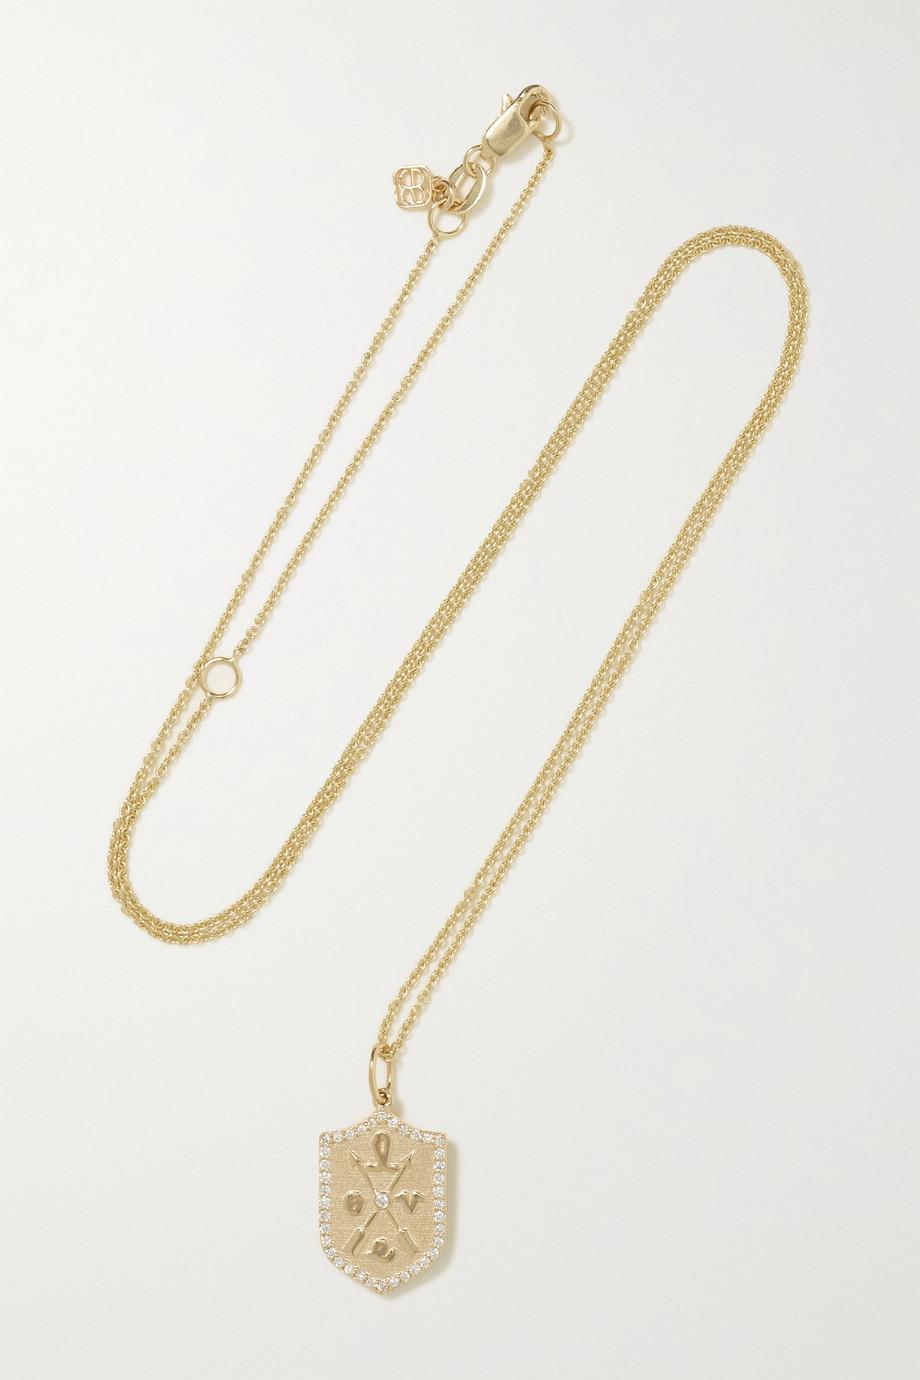 Sydney Evan Collier en or 14 carats et diamants Love Small